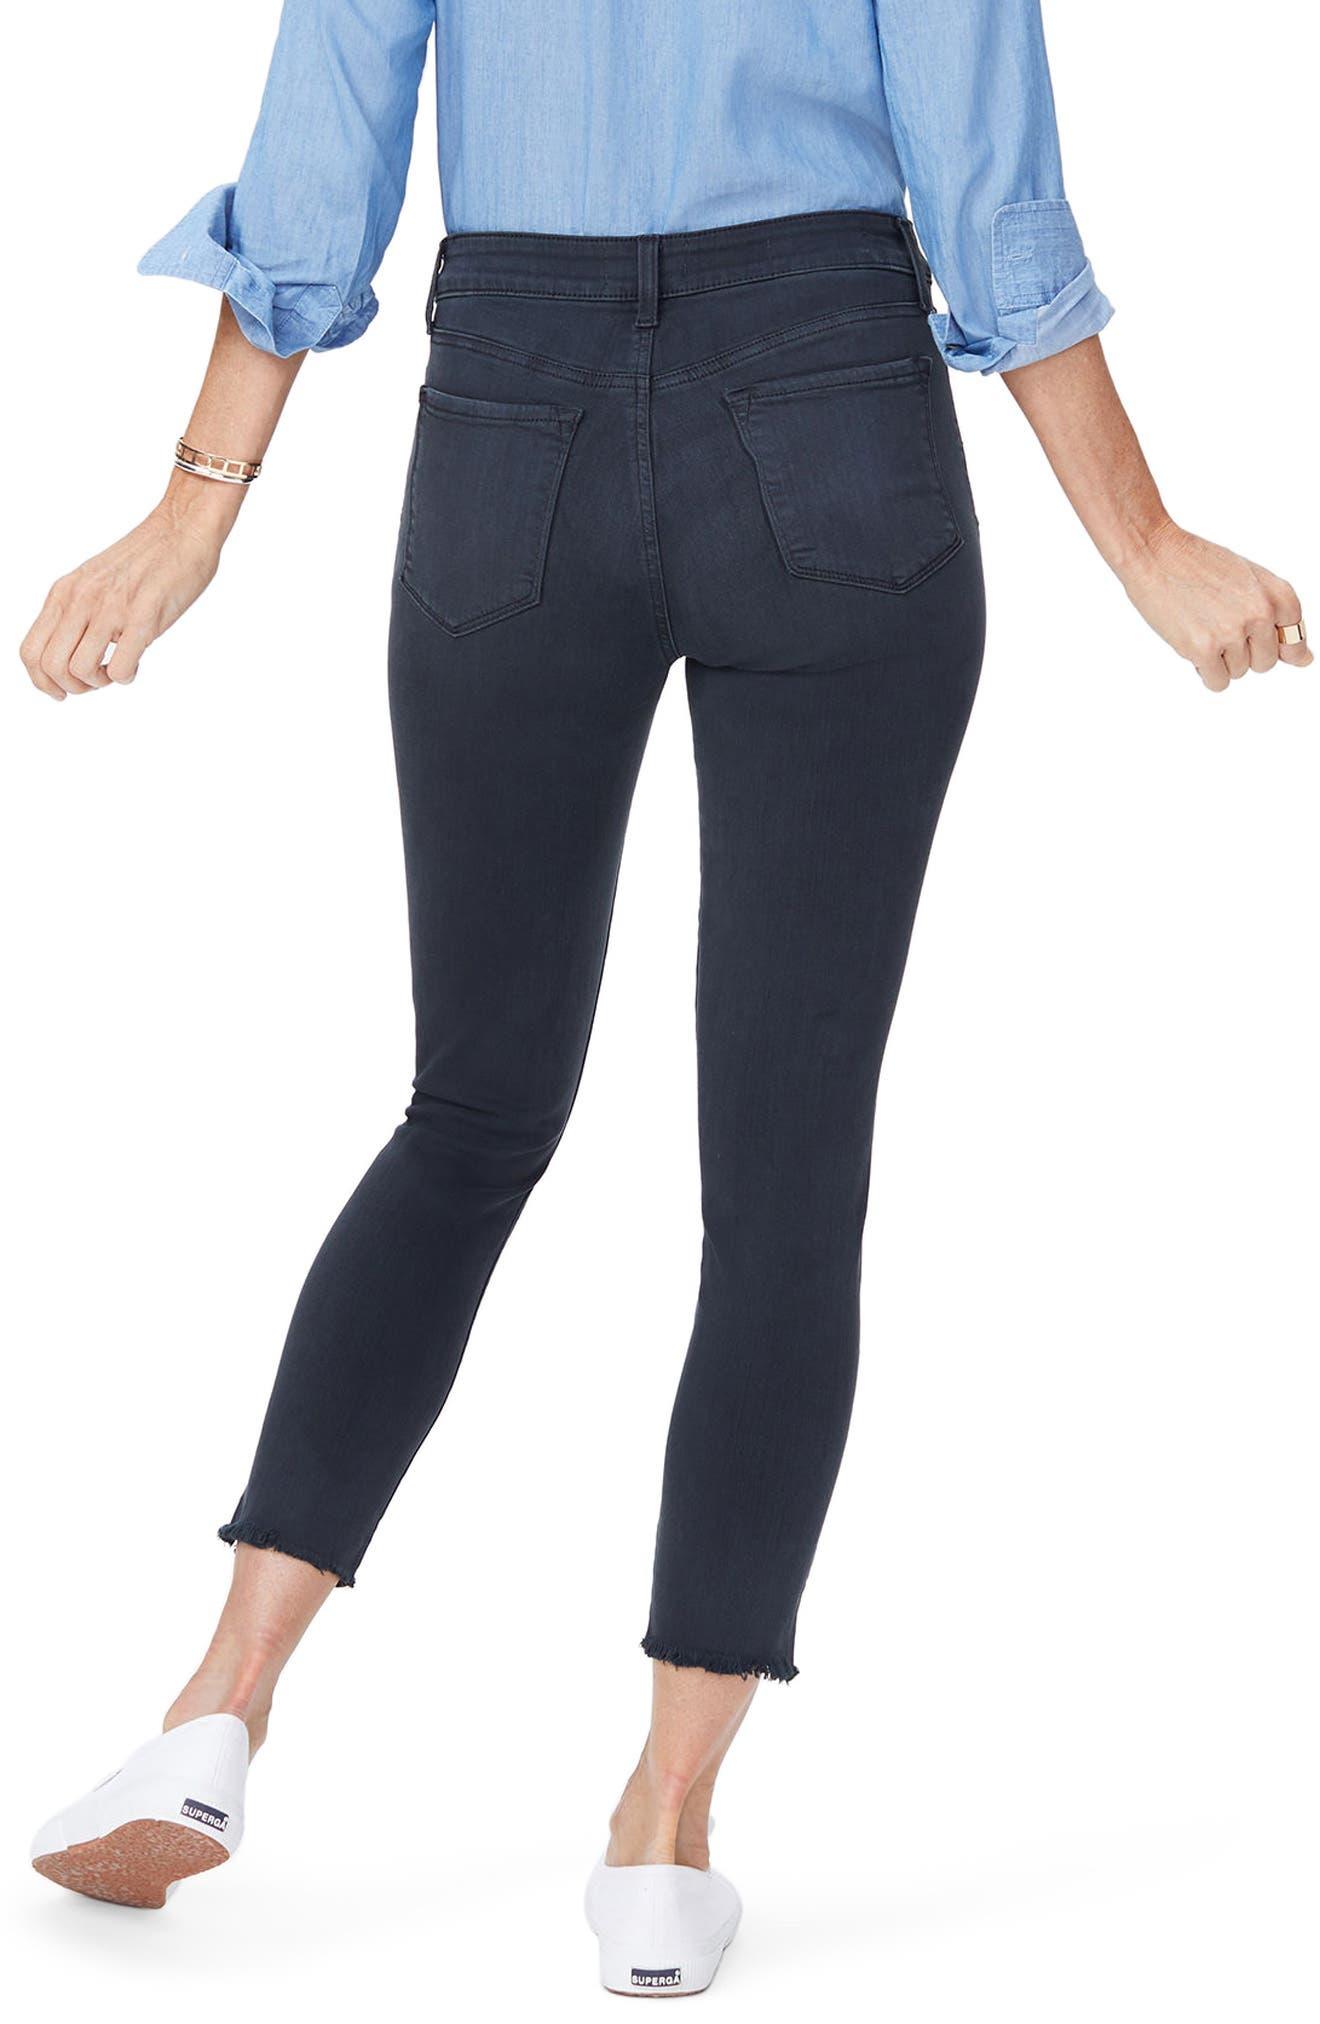 Ami Side Slit Fringe Hem Skinny Jeans,                             Alternate thumbnail 2, color,                             007